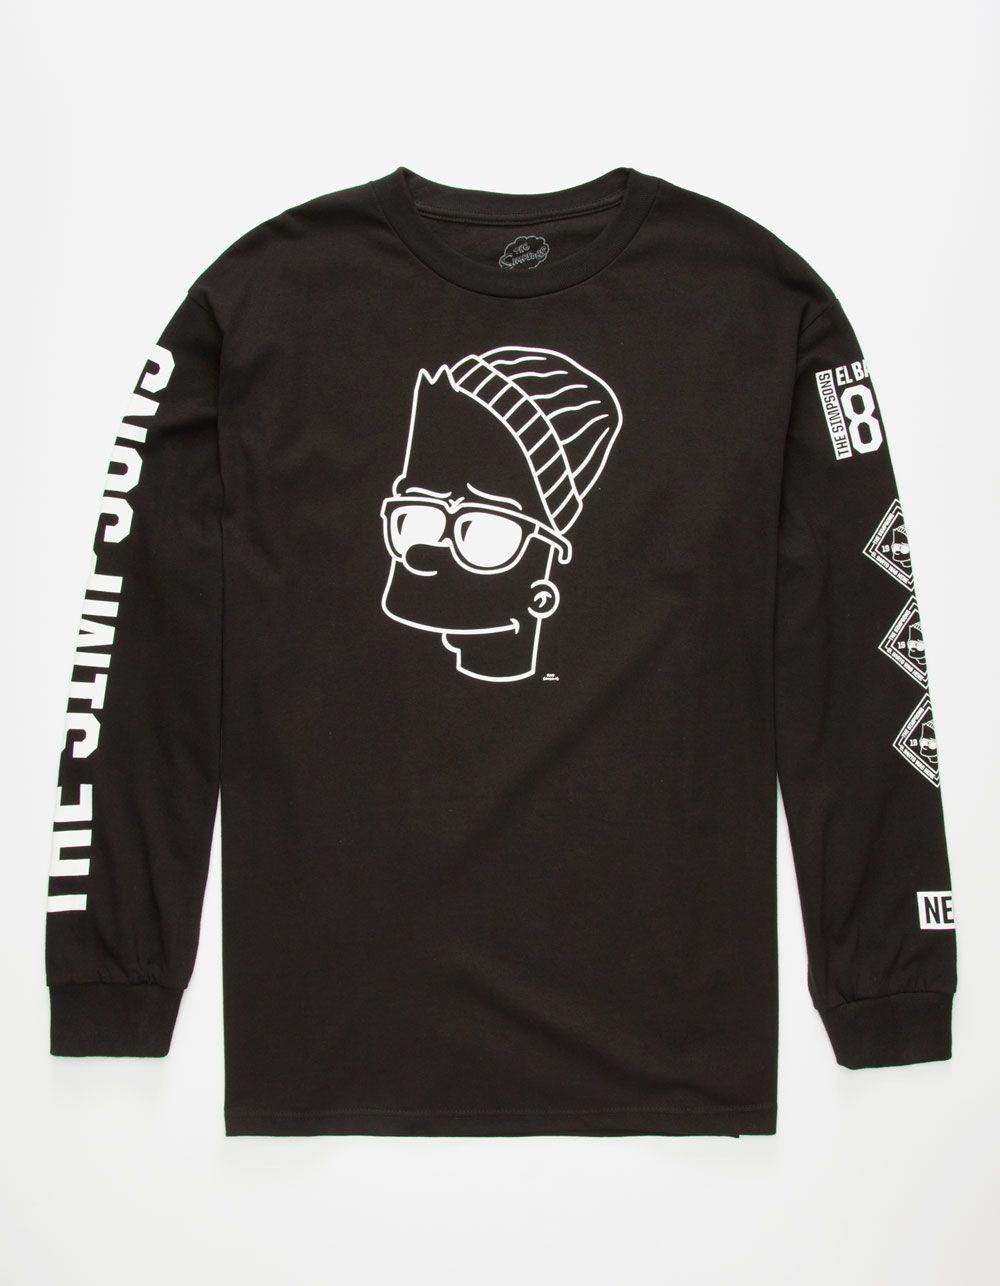 cbc20535 NEFF x The Simpsons Steezy Bart Mens T-Shirt 263211100 | L/S & Baseball Tees